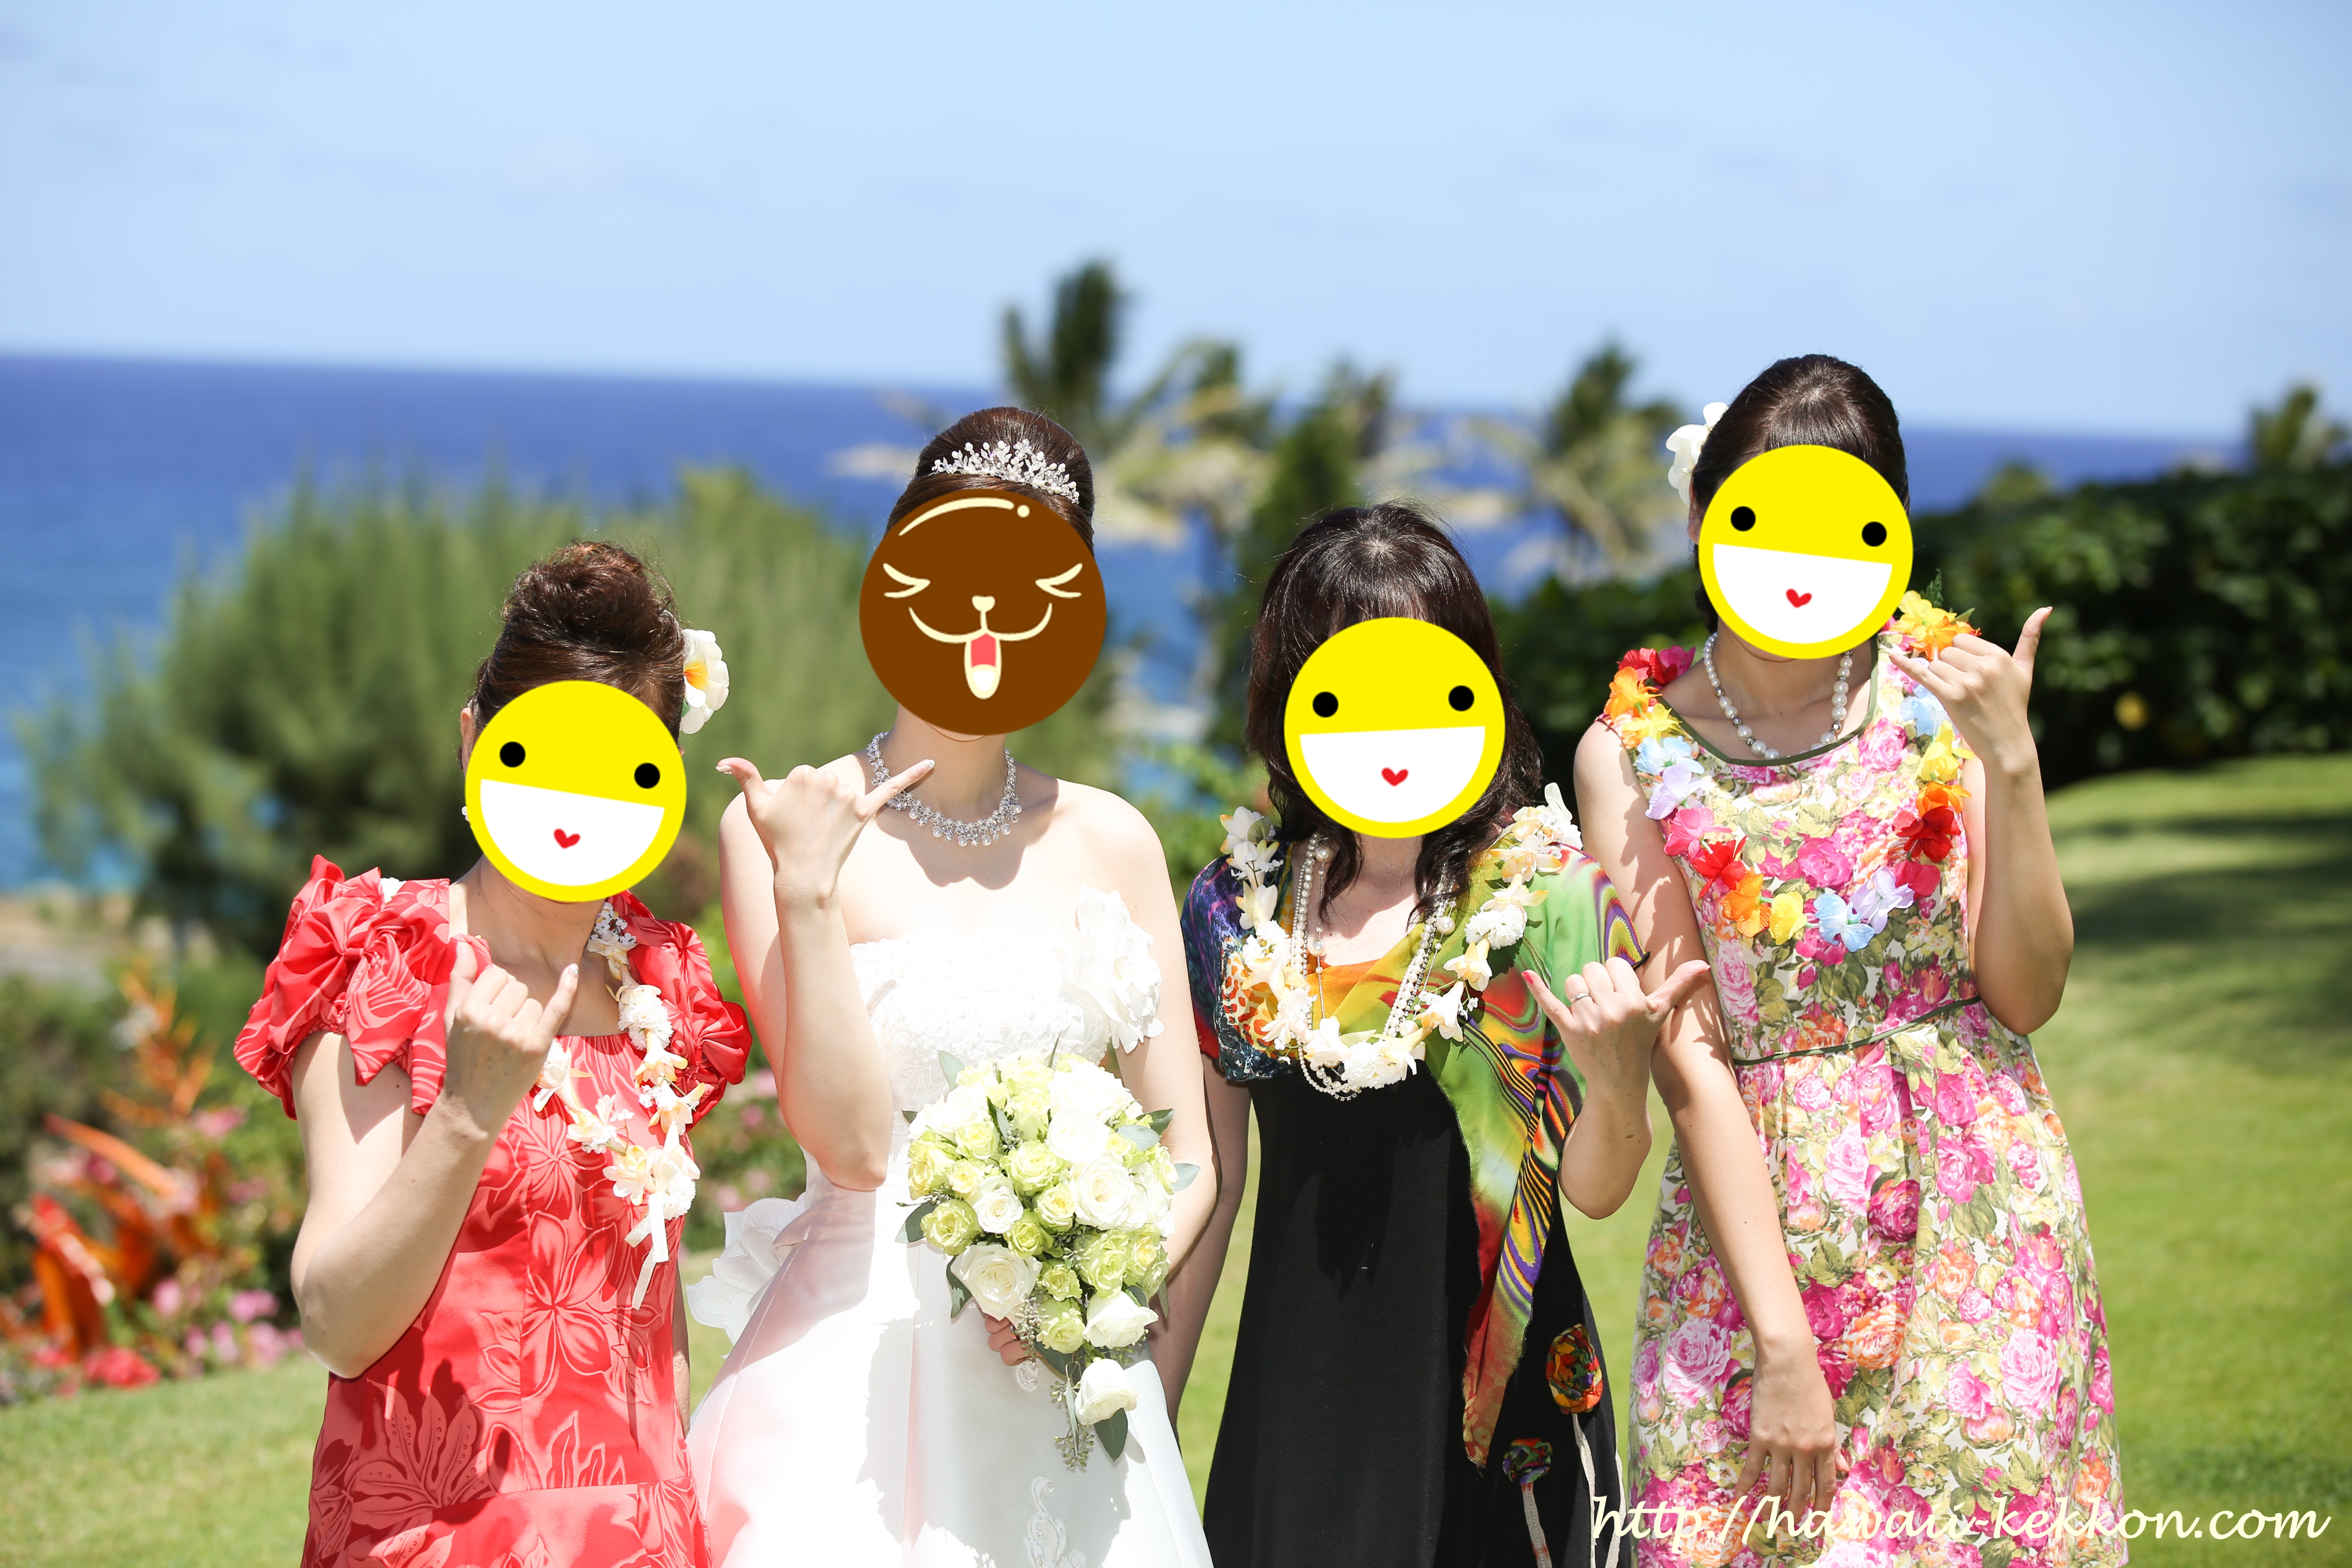 5ecbaf6406db1 グアム挙式の参列者の服装は何が正解?マナー違反はあるの?|ハワイ挙式計画